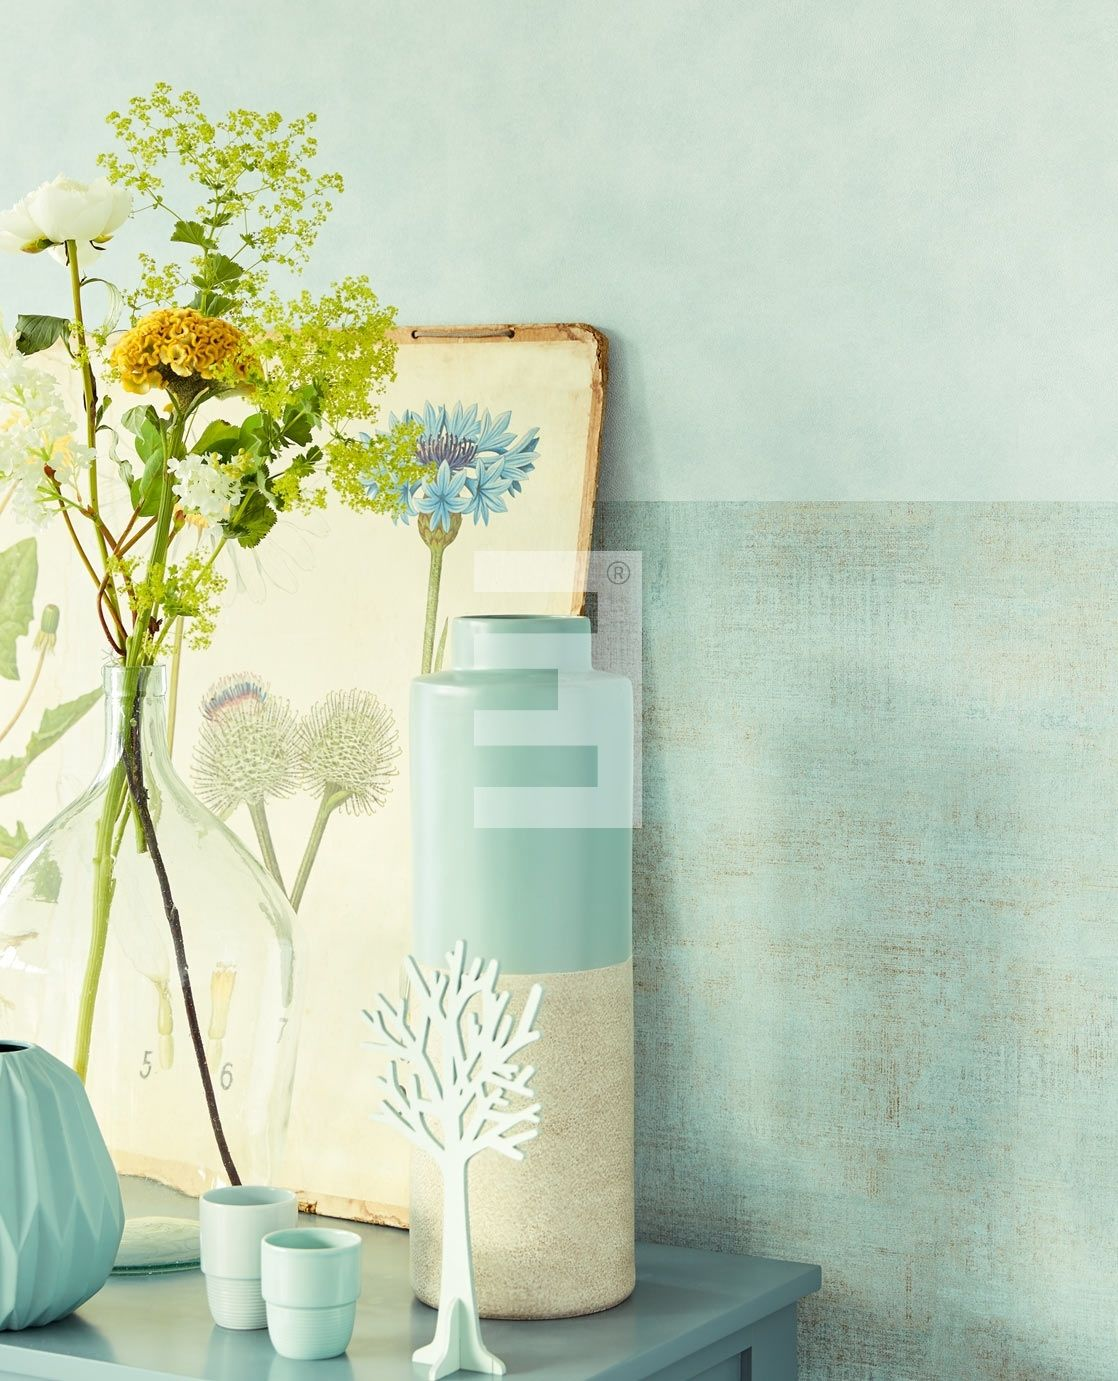 Products - Behang - Kleur:Groen   Behang woonkamer   Pinterest ...